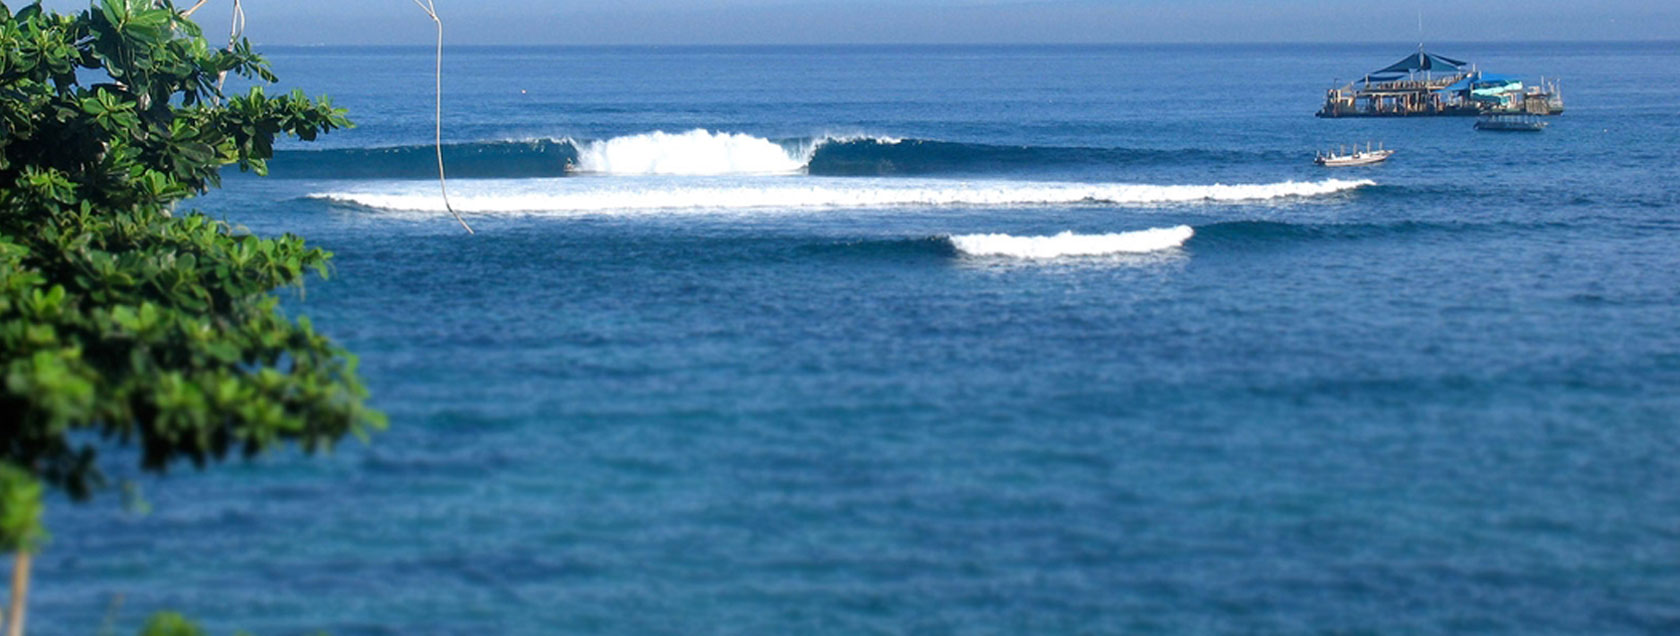 Playgrounds - Surfing Lembongan